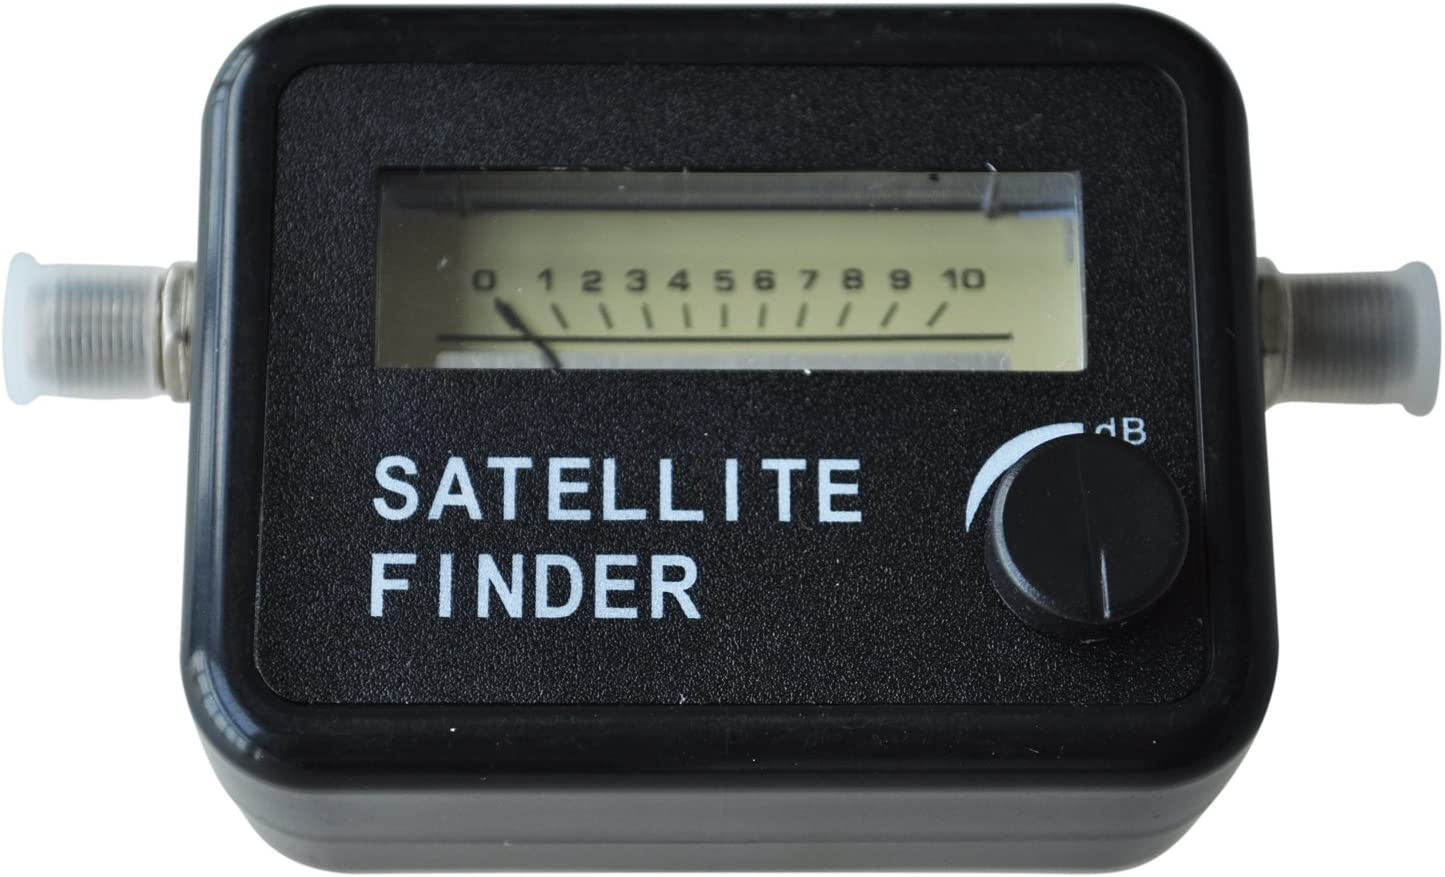 SODIAL(R) Busca Satelite Satellite Finder Medir Senal